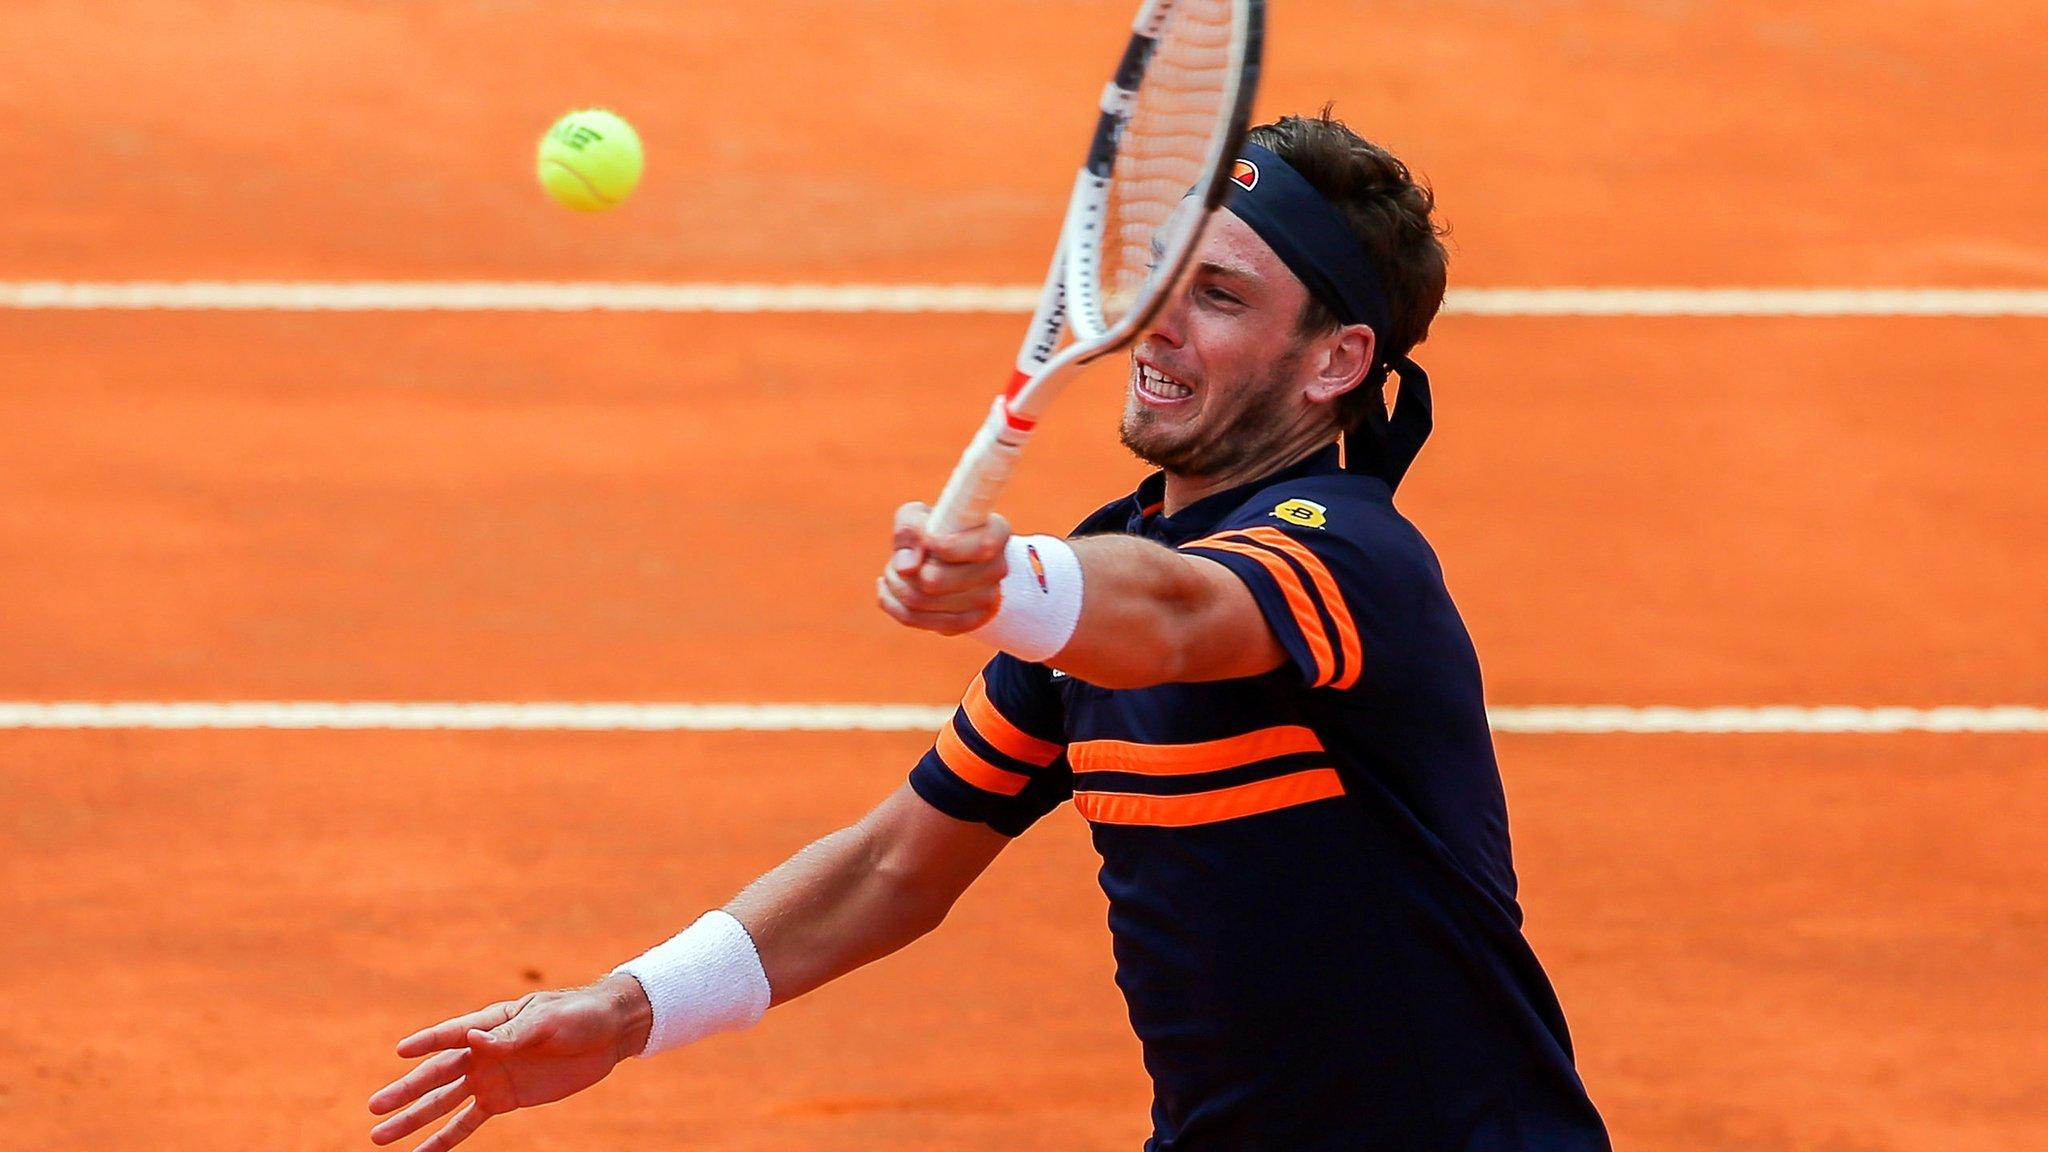 Lyon Open: Cameron Norrie beats Jose Hernandez-Fernandez to reach round two